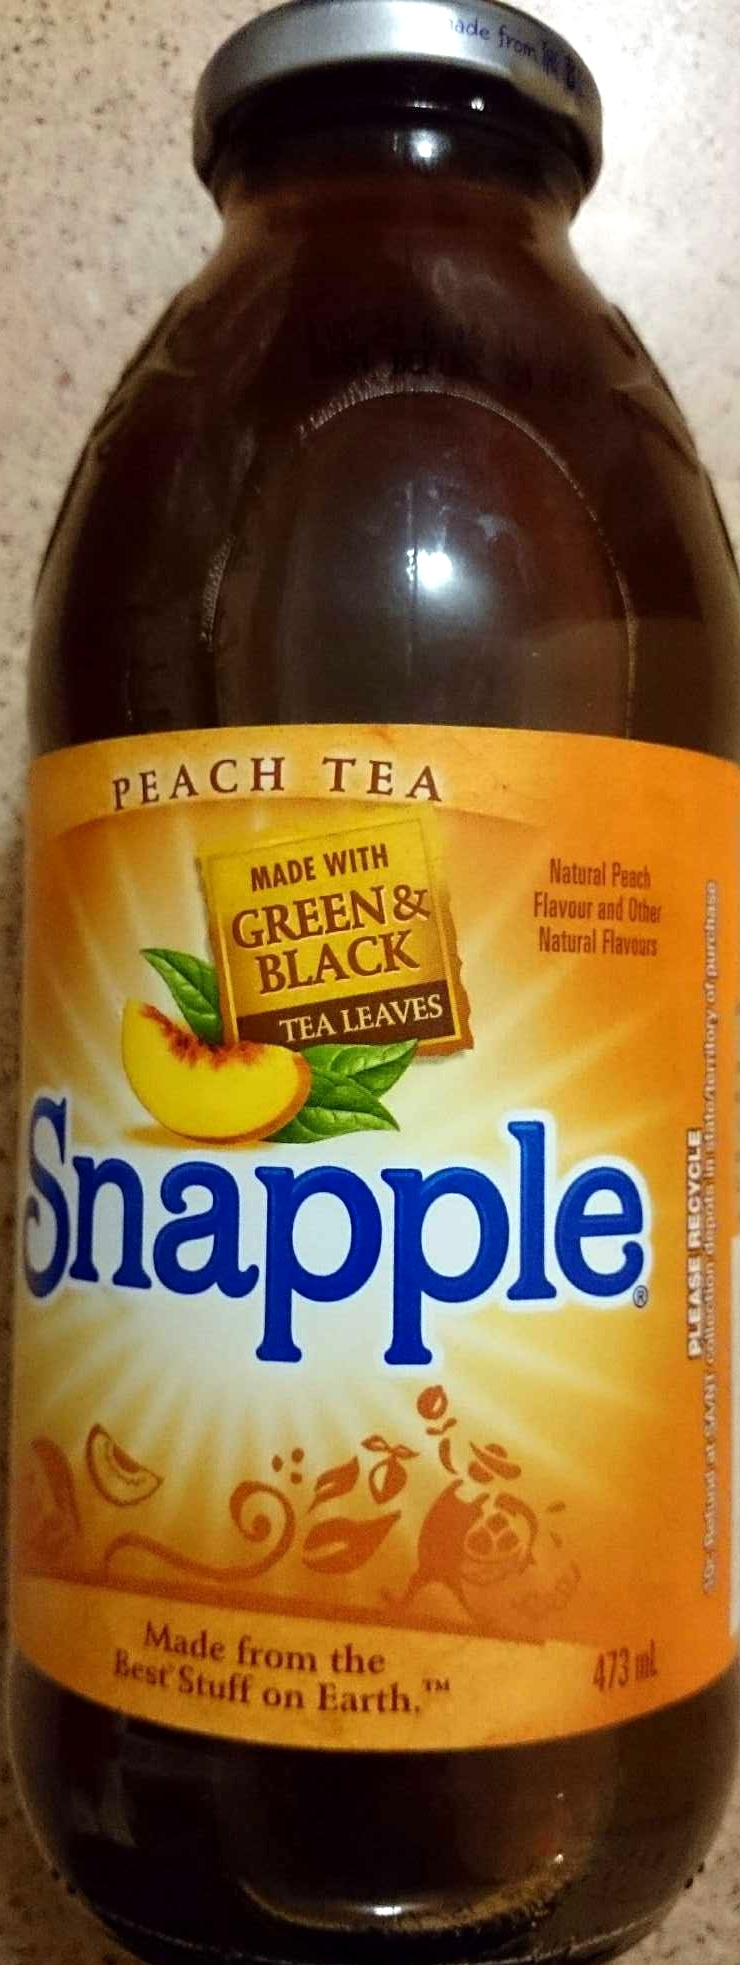 Peach Tea - Product - en